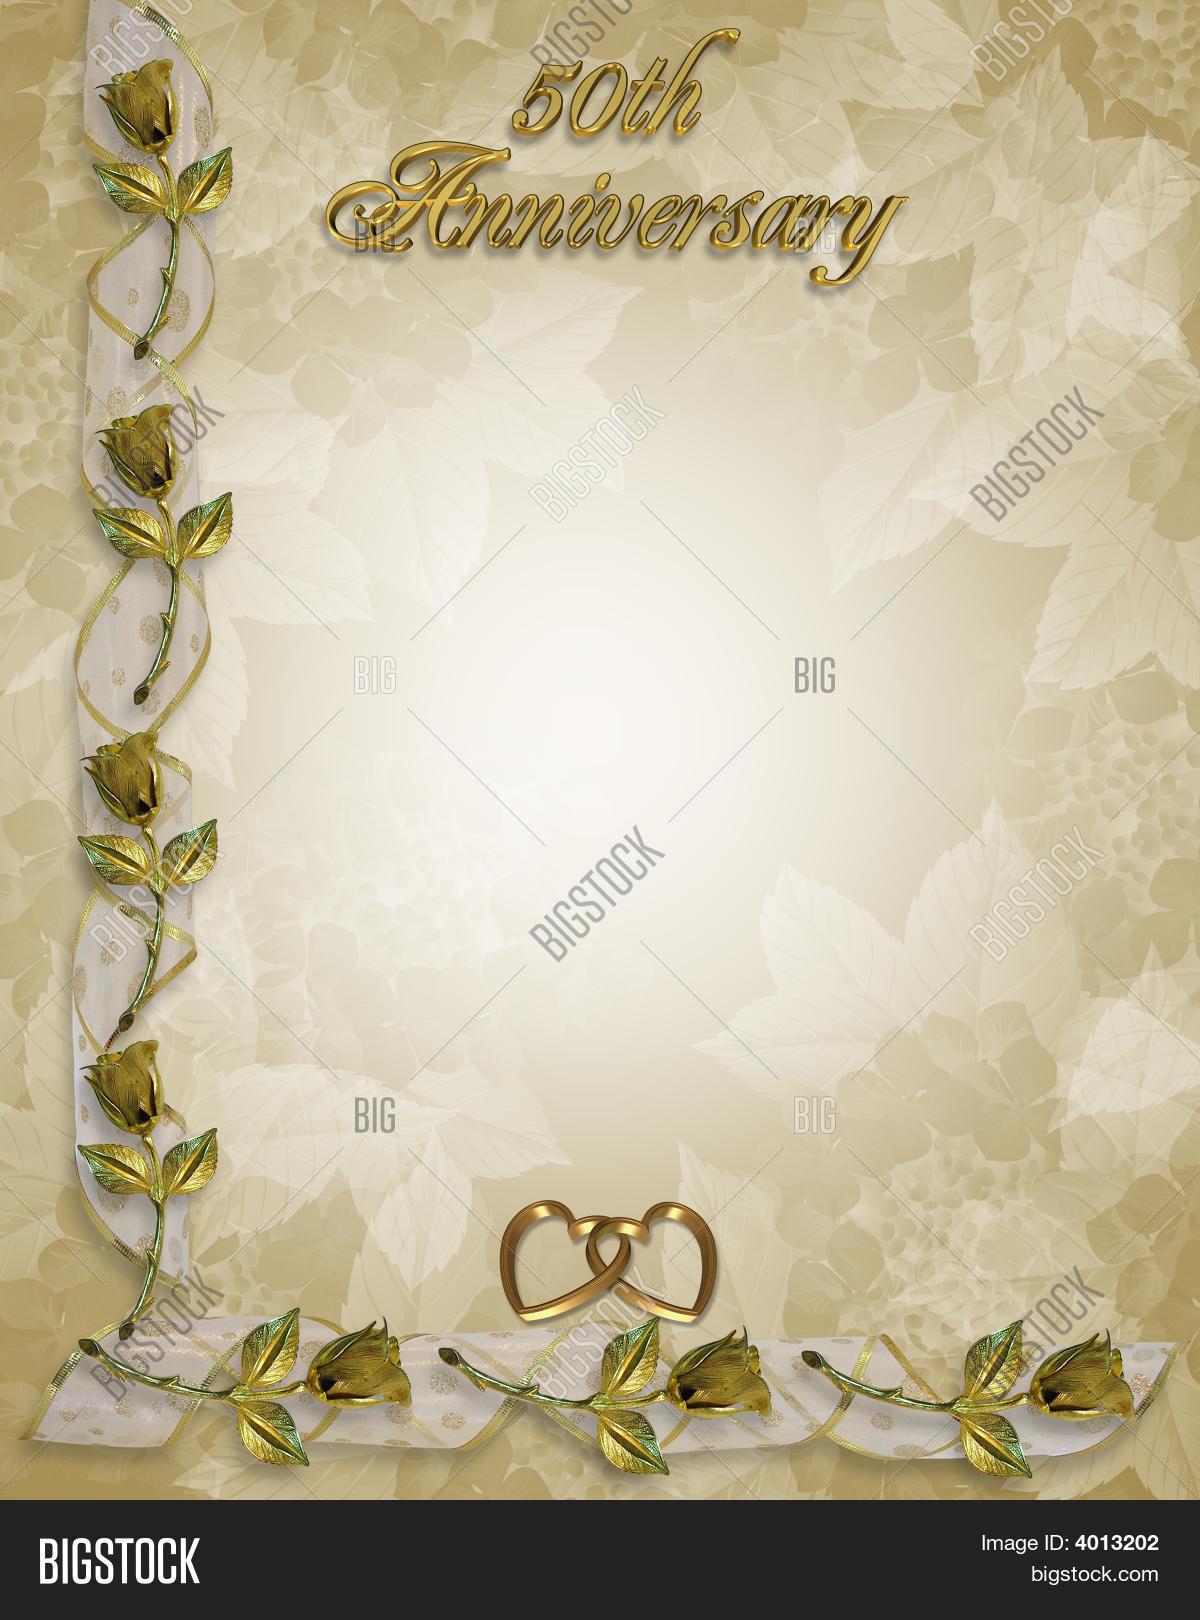 50Th Wedding Anniversary Golden Image Amp Photo